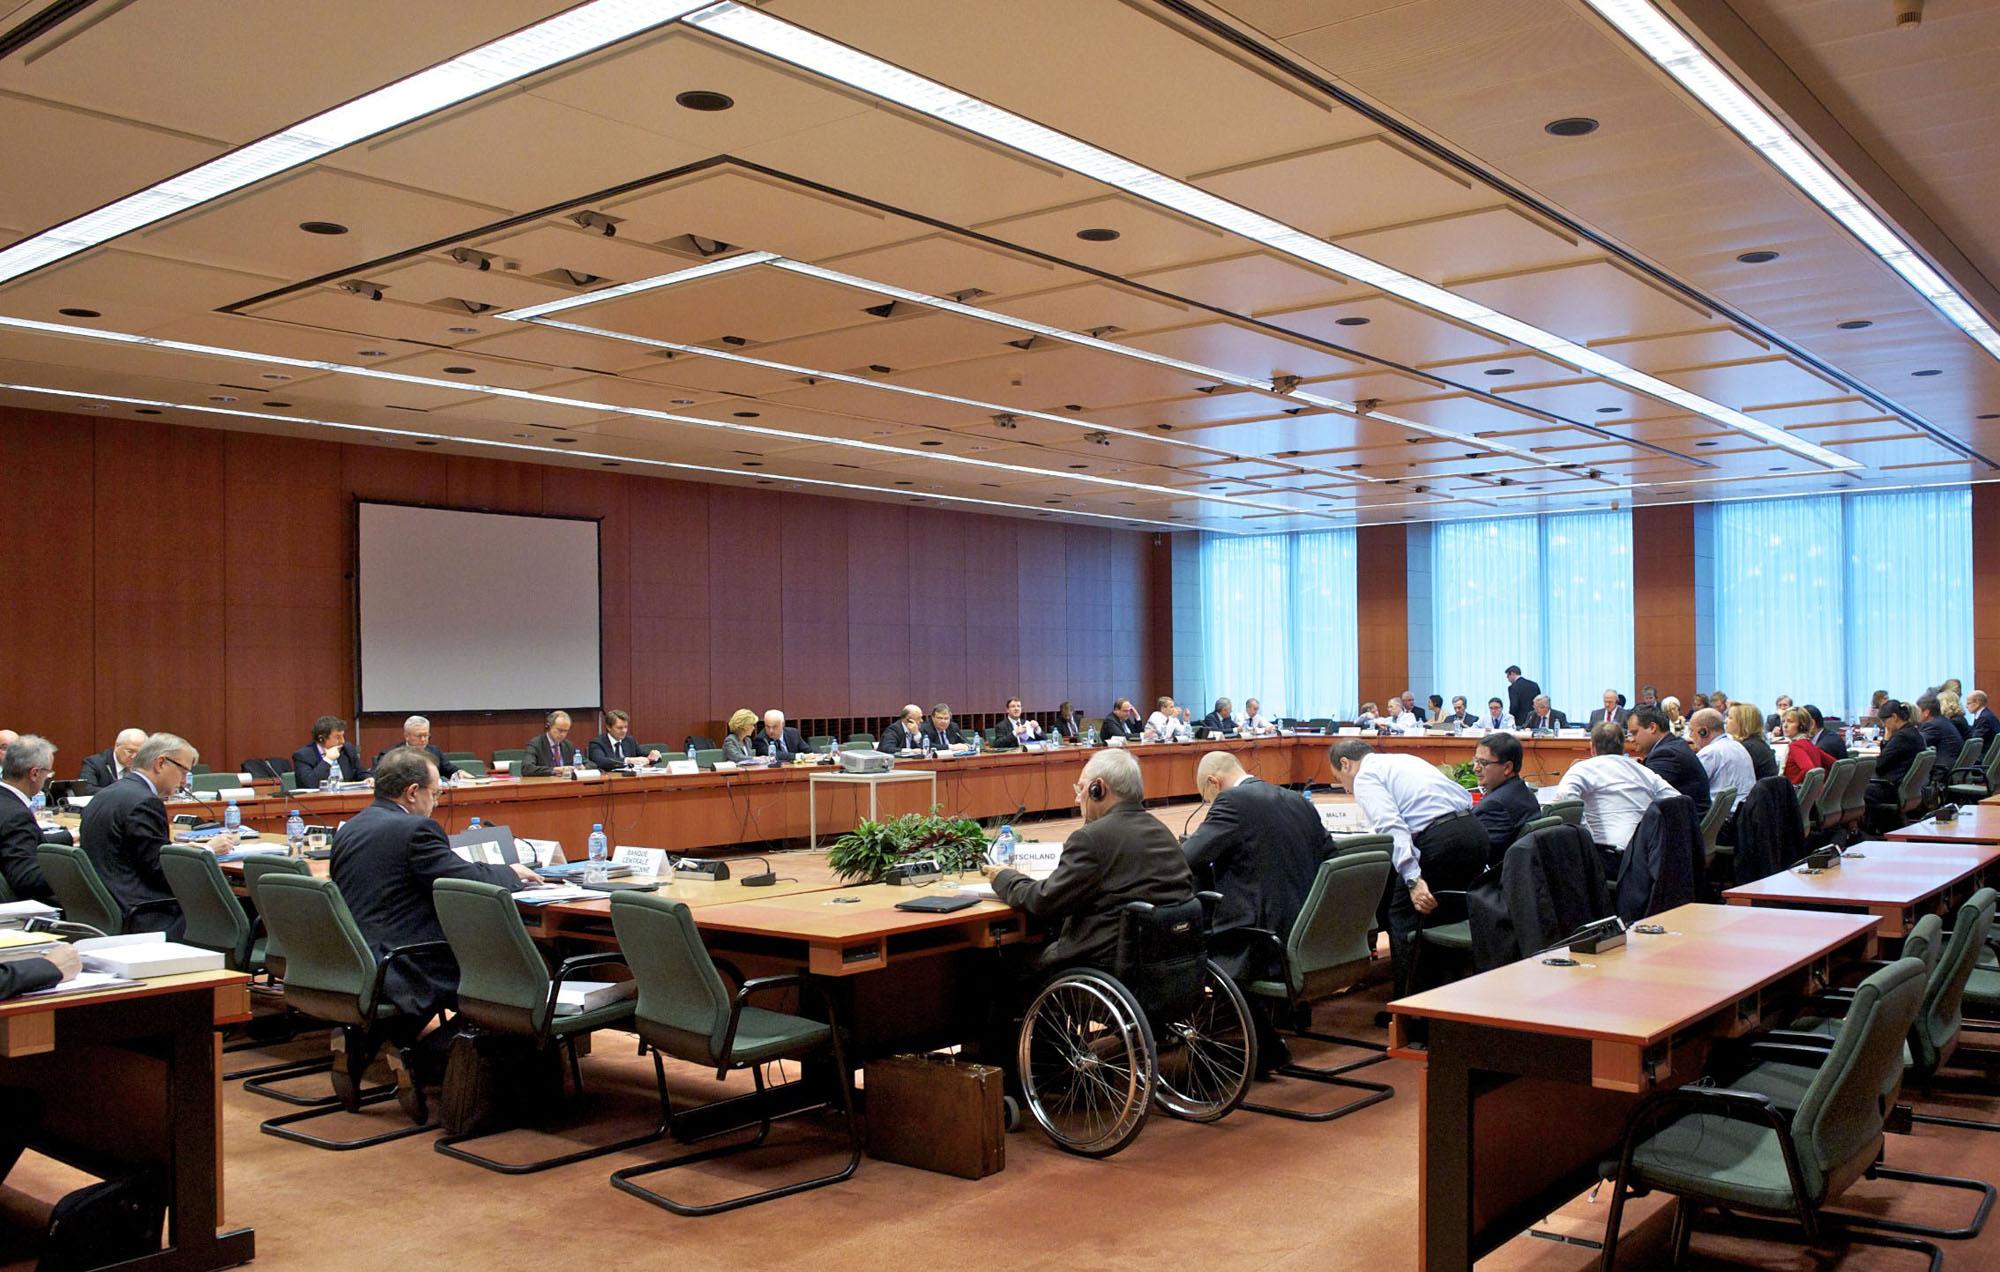 Eurozone issues Greece an ultimatum